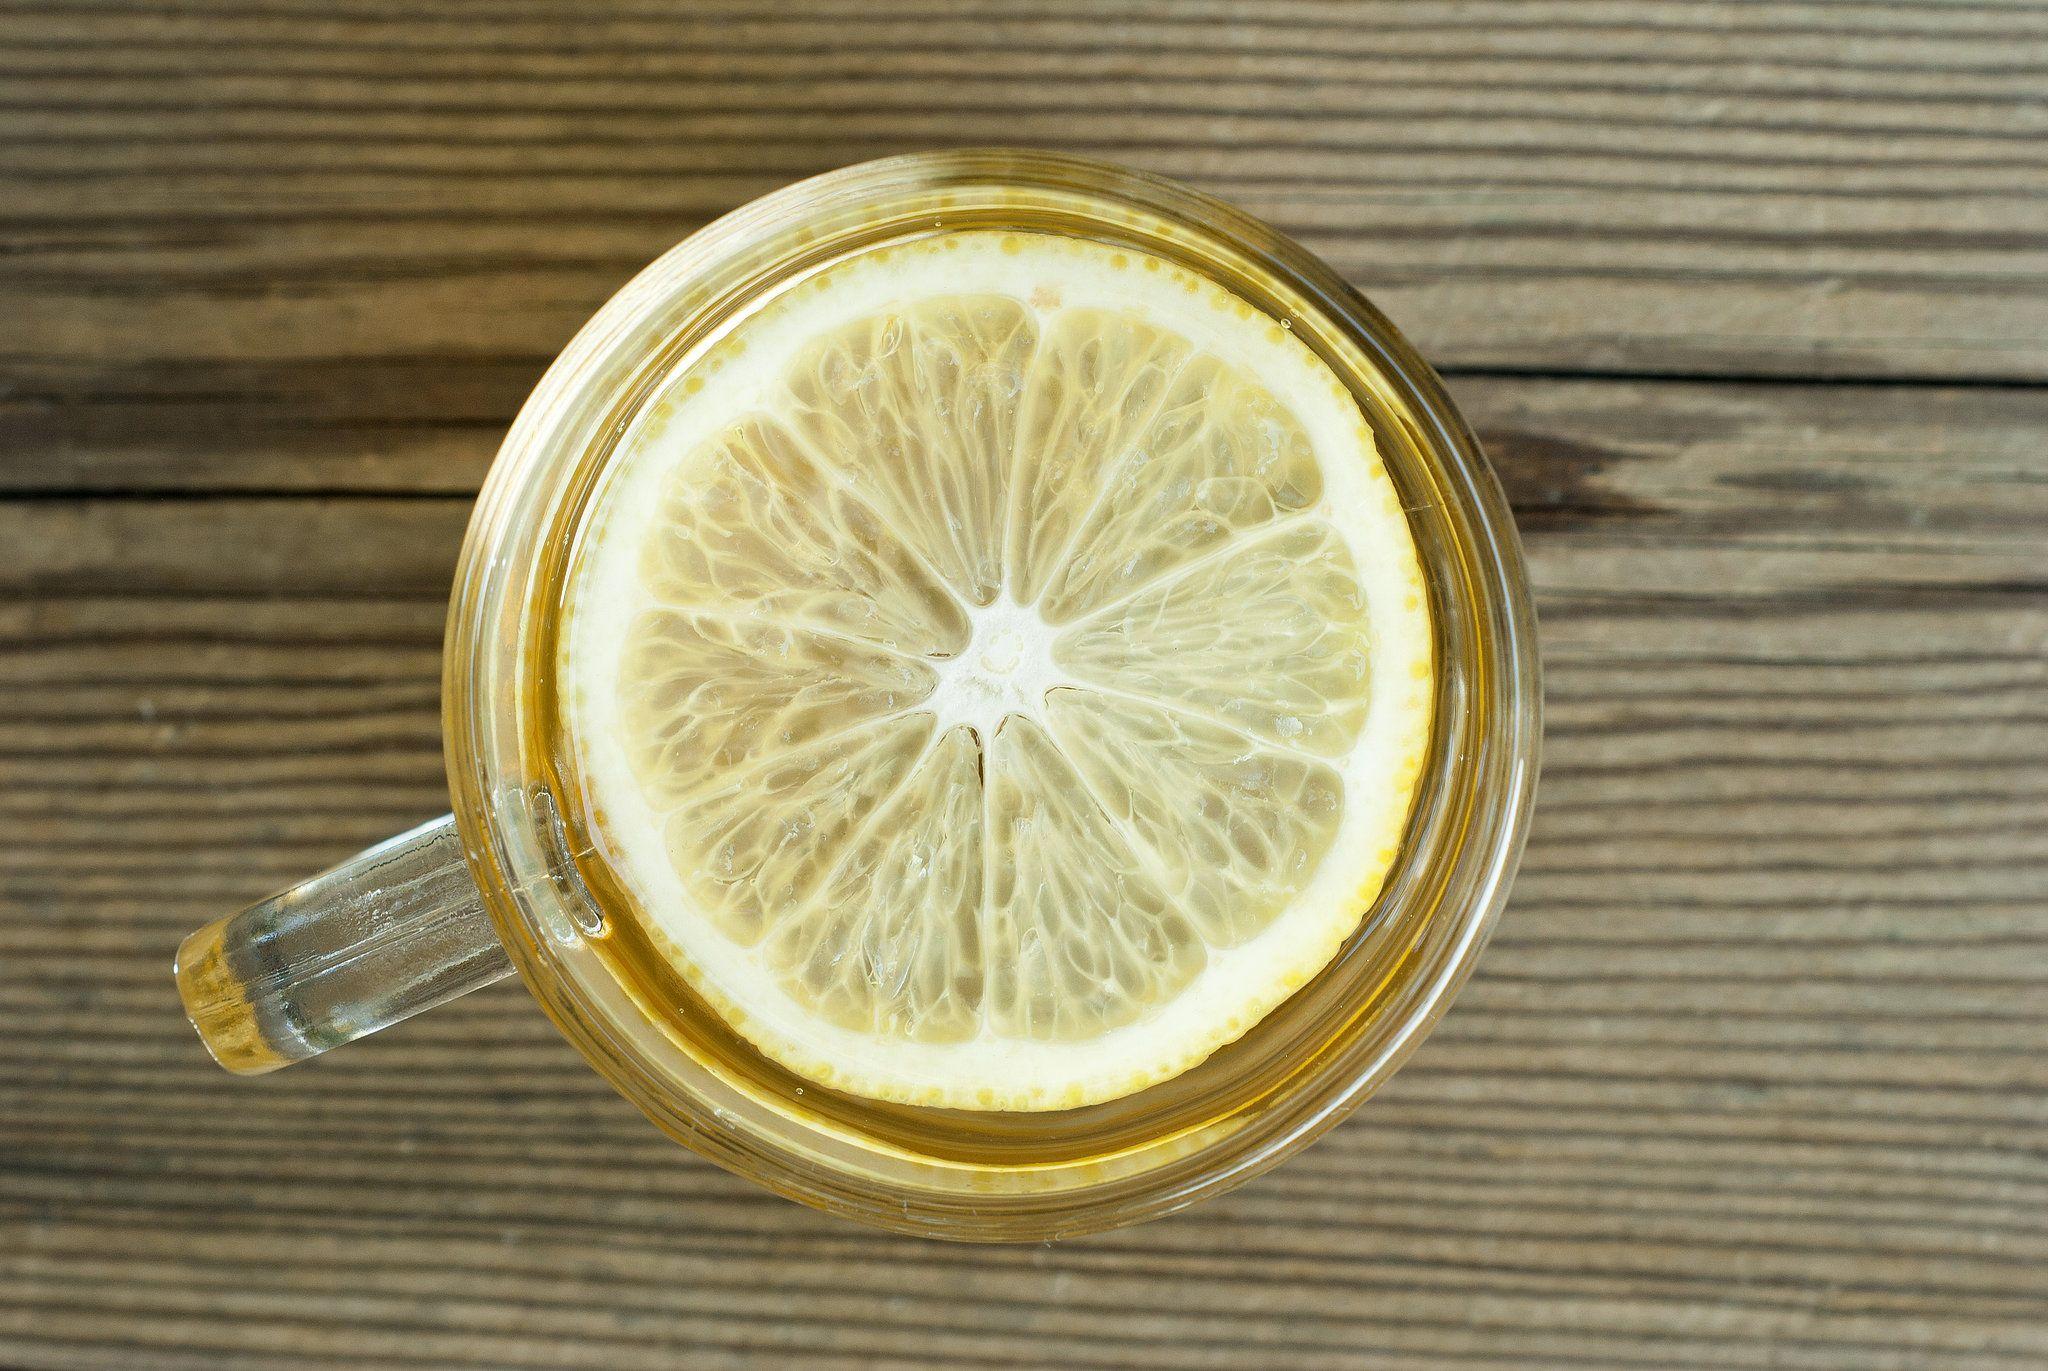 4 Khasiat Minum Air Lemon Panas Setiap Hari